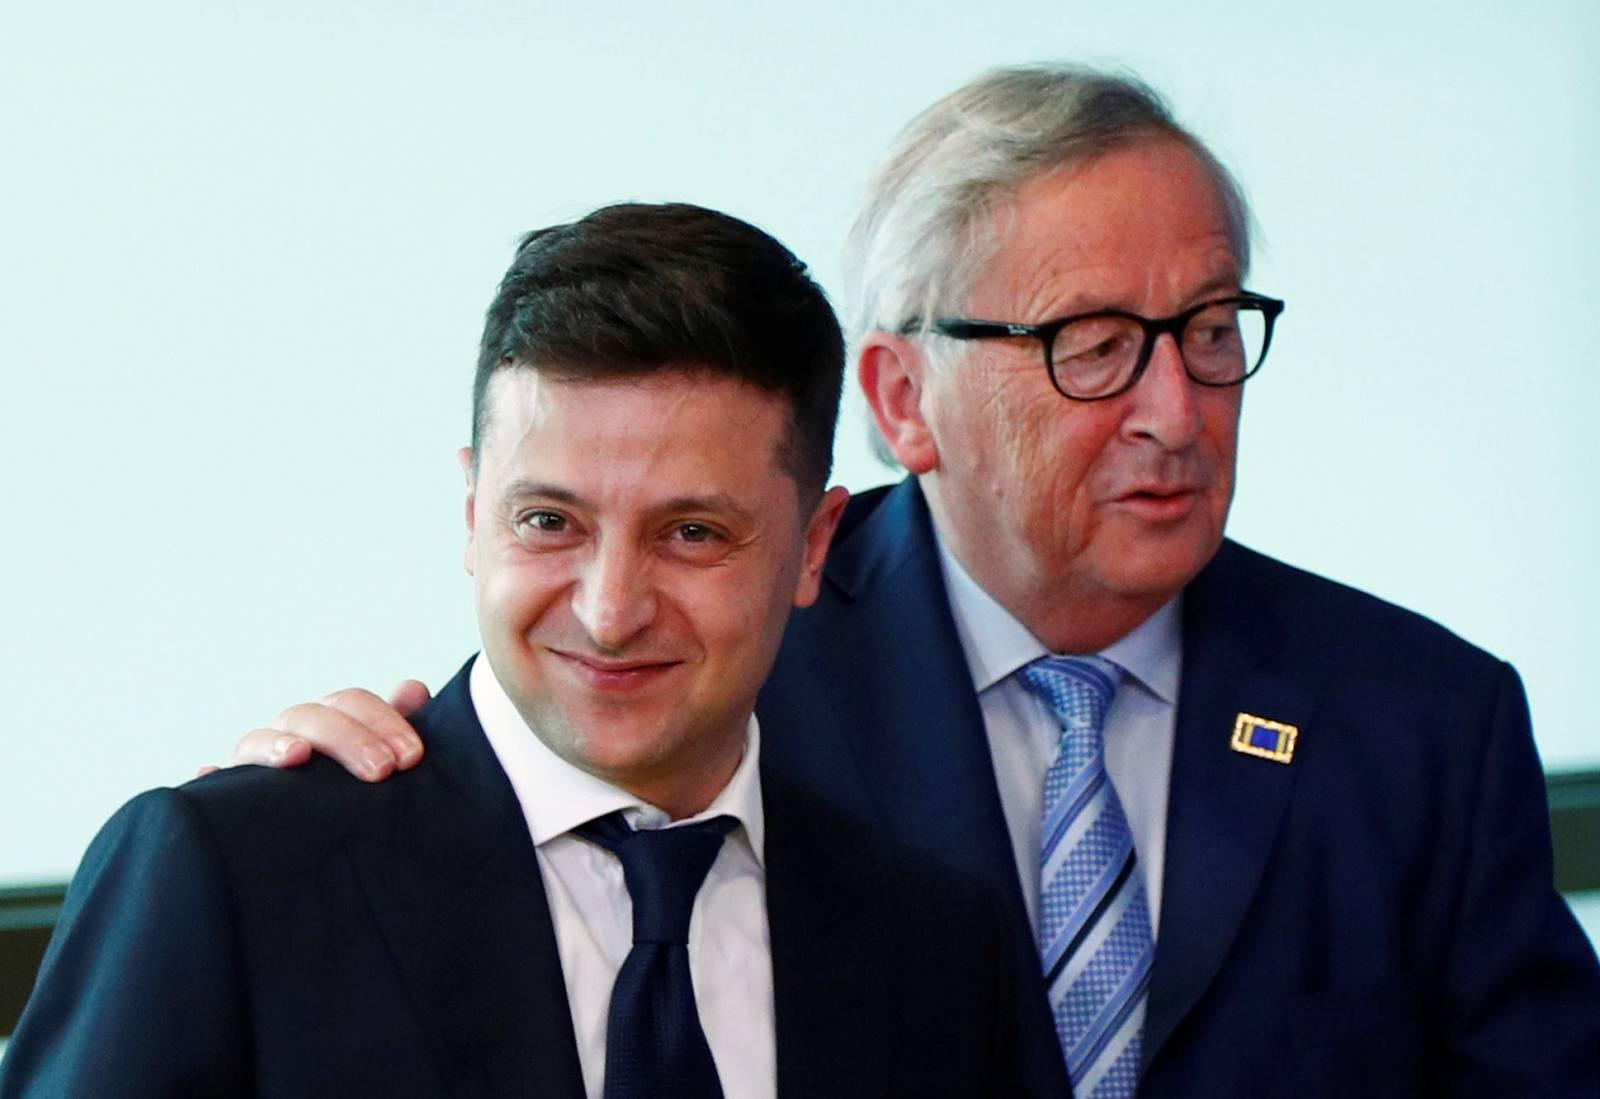 UkrainianÊPresidentÊVolodymyr Zelenskiy poses with EU Commission President Juncker in Brussels